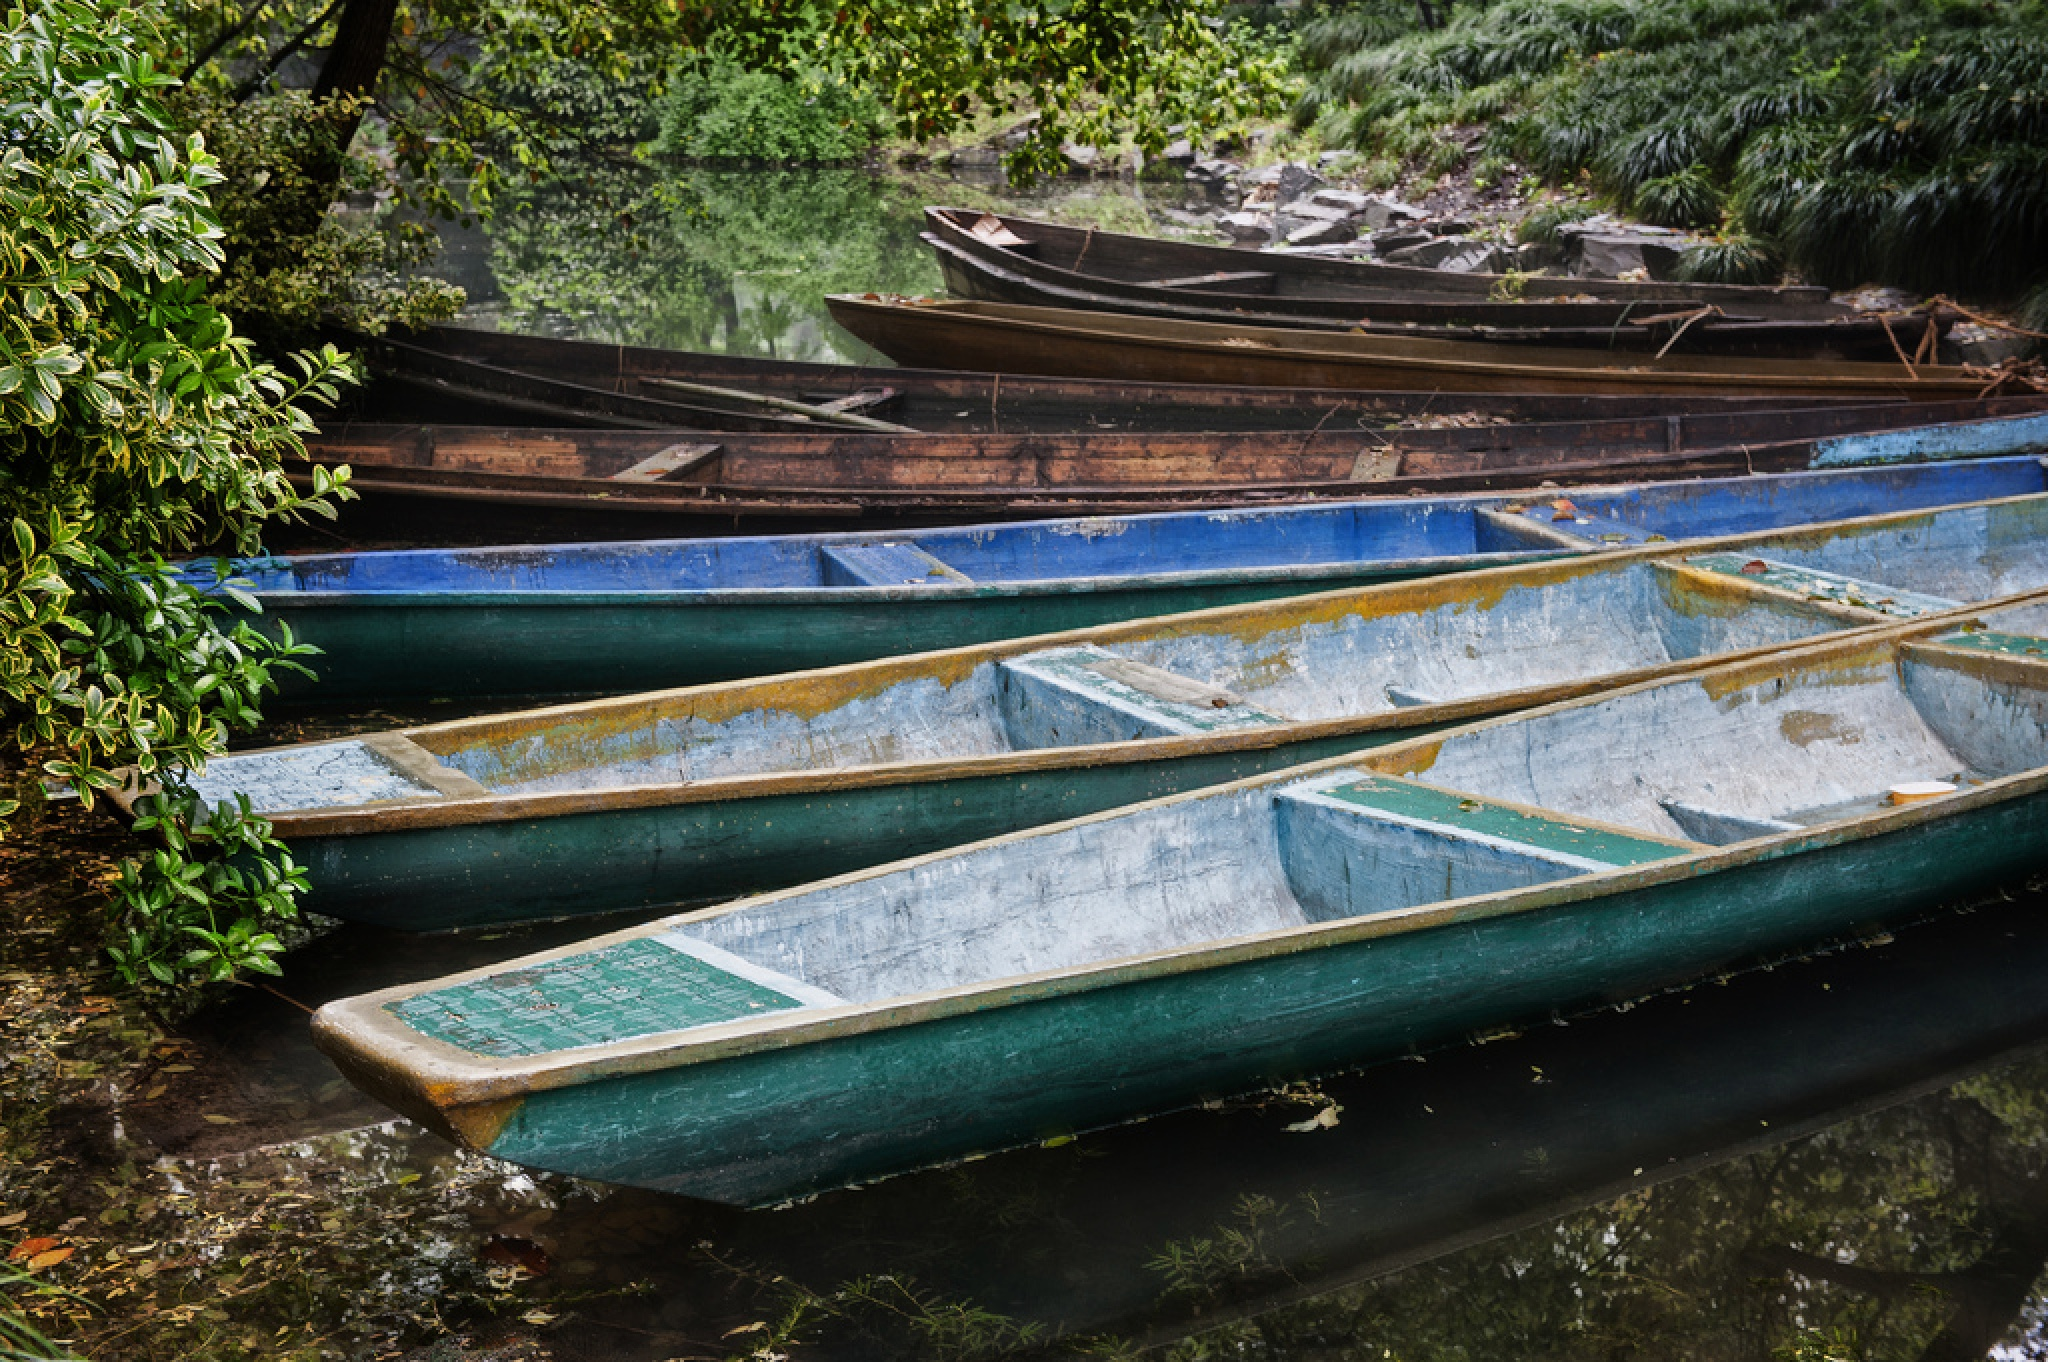 Chinese gondolas by Neil Morgan